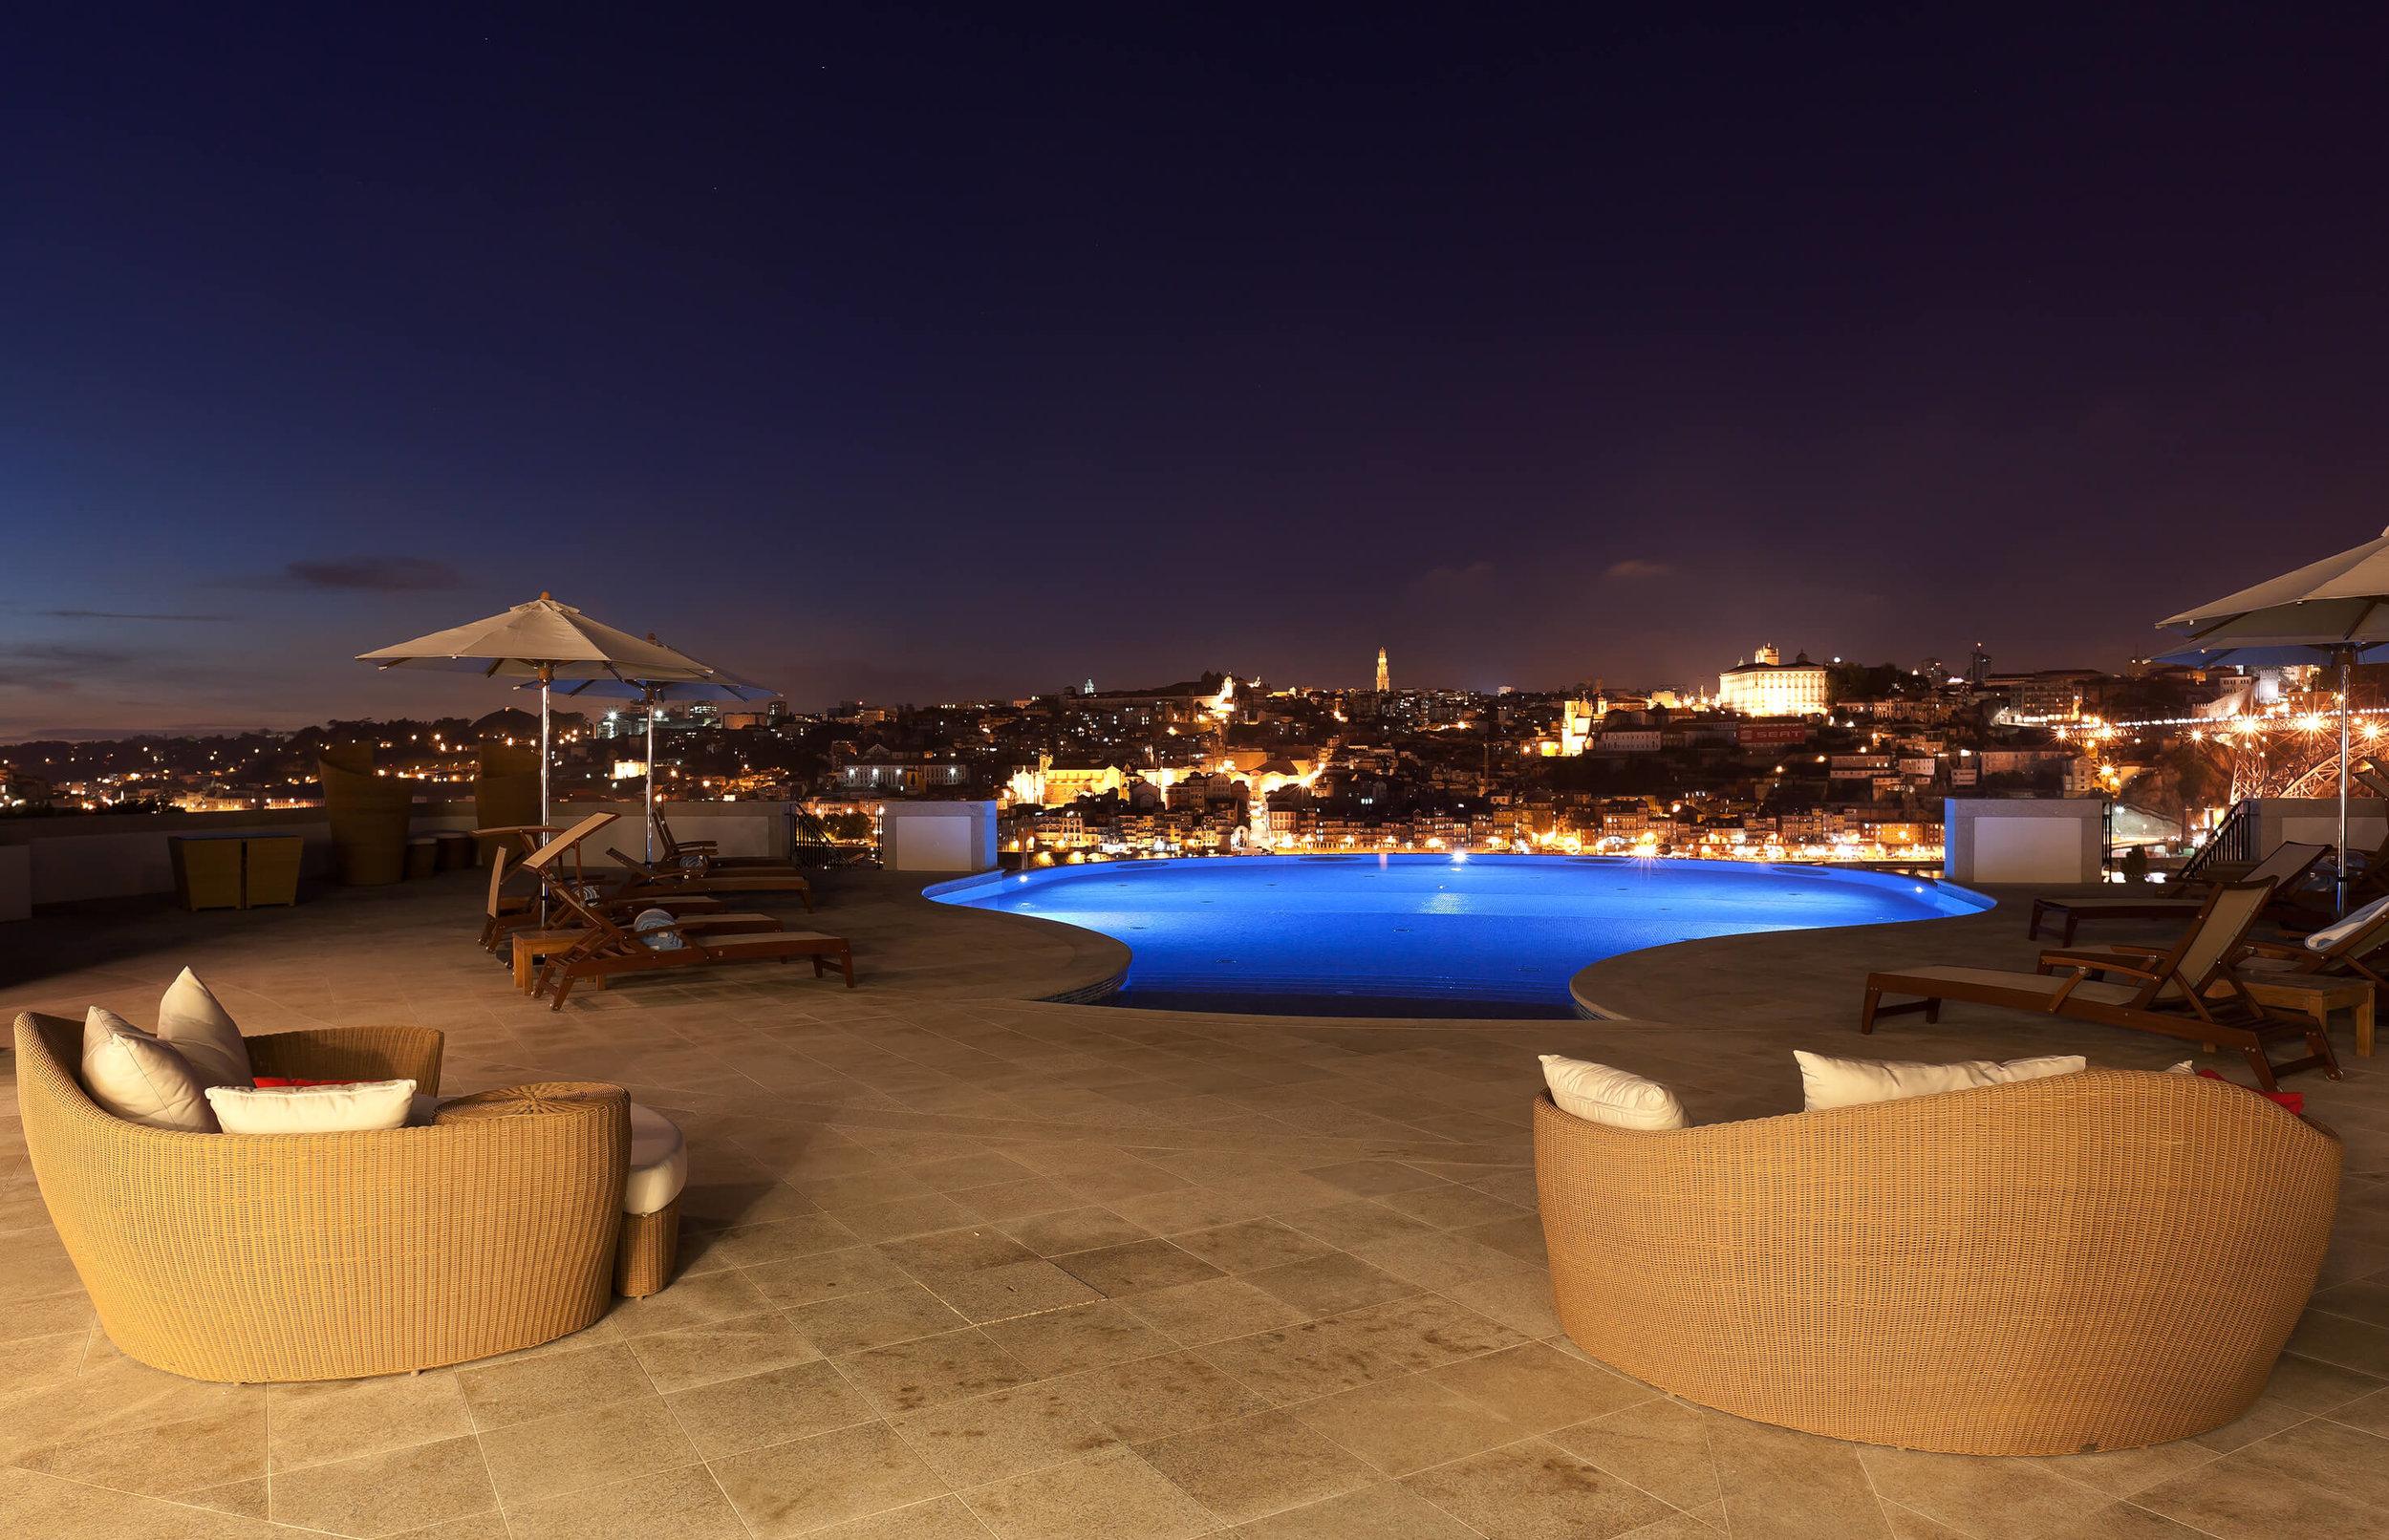 Infinity Pool - Outdoor - Night.jpg